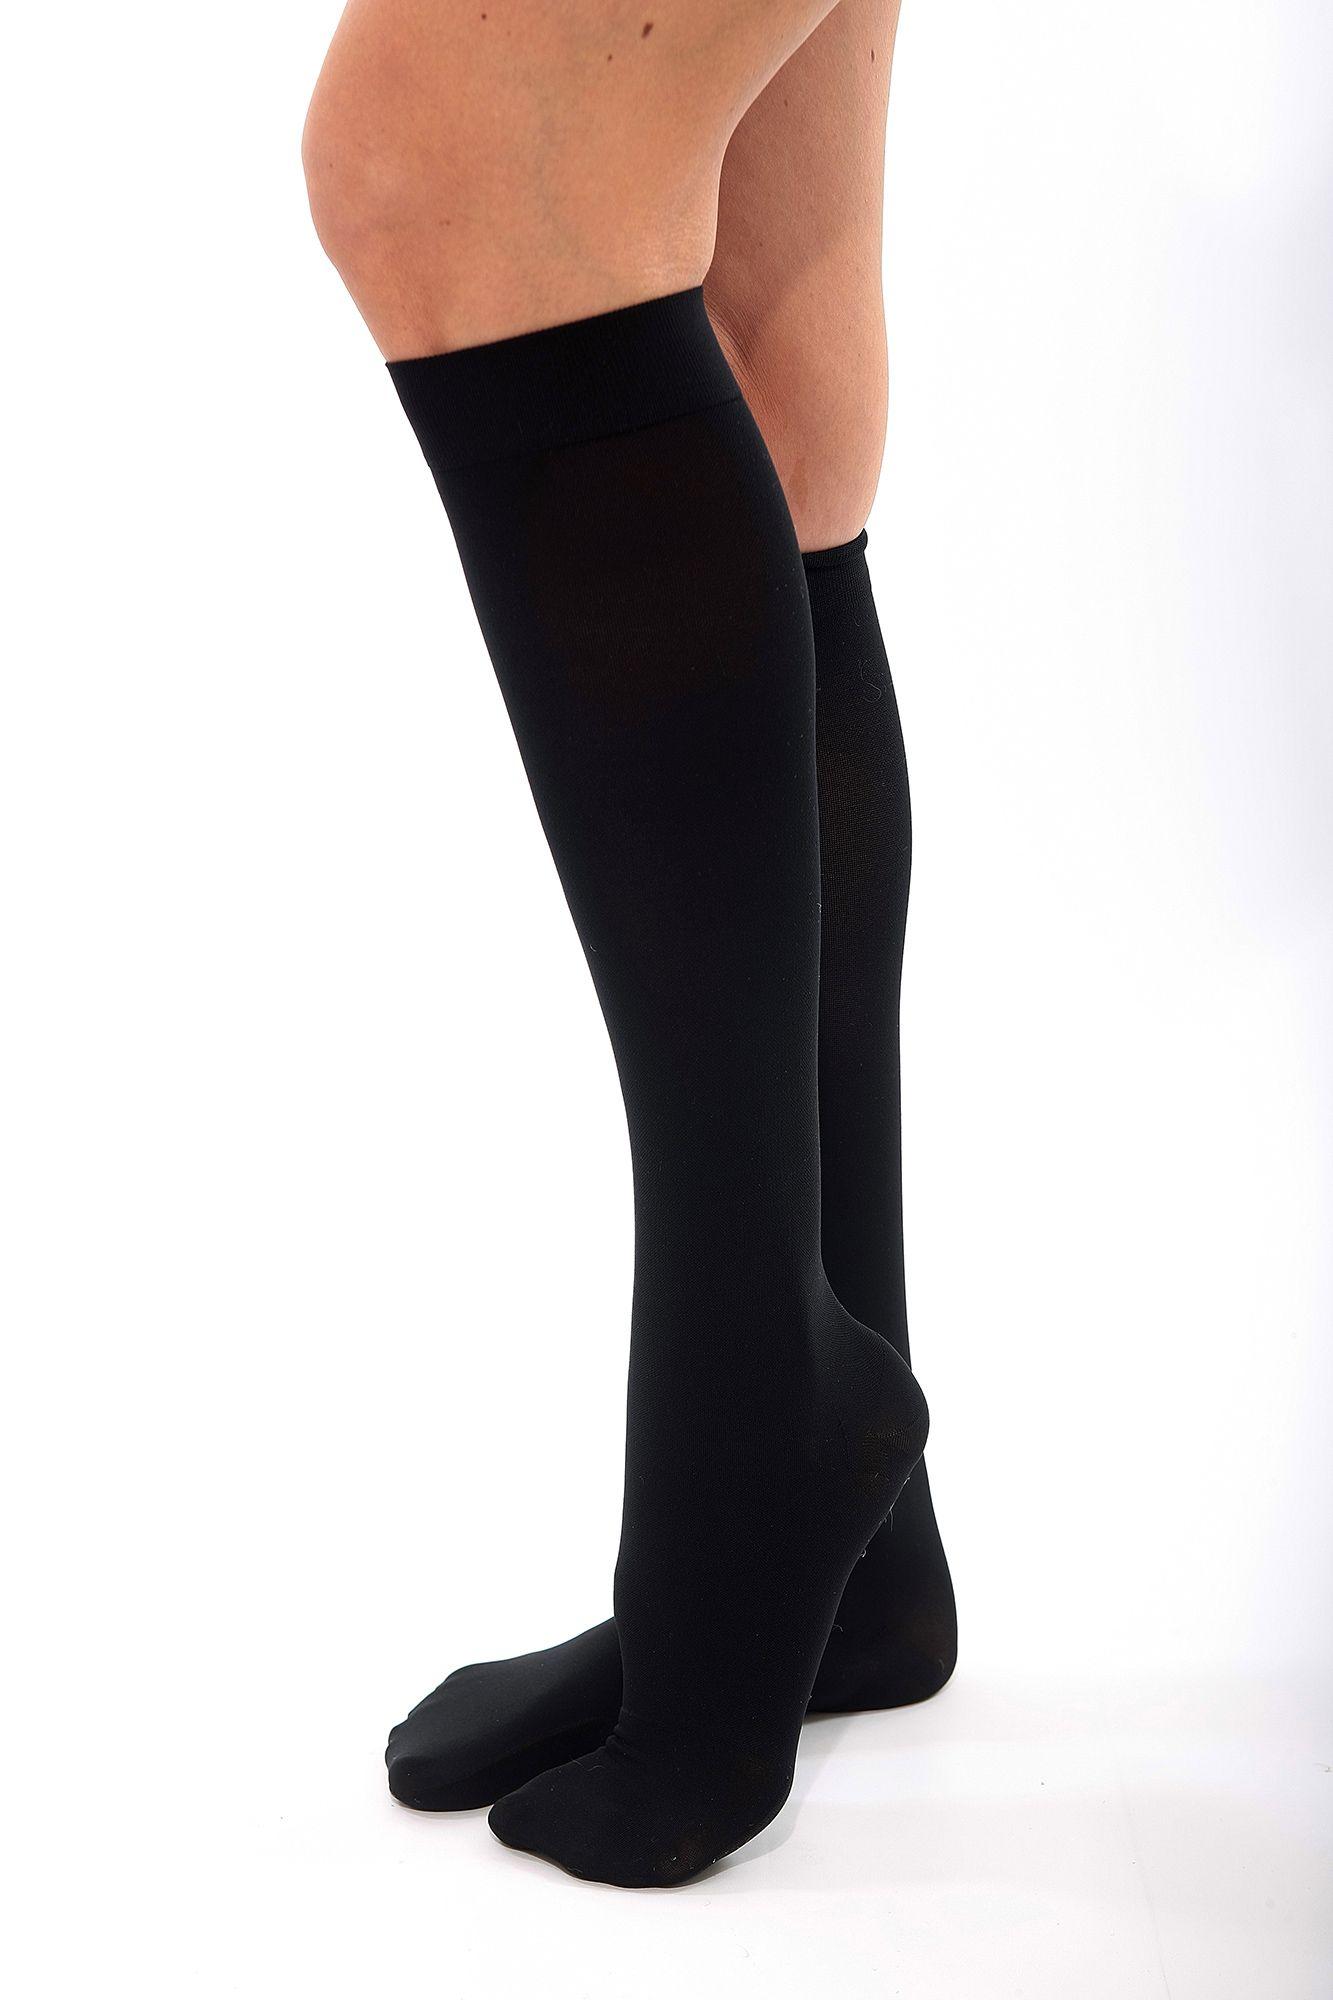 ddc454aa68 VENOSAN® Silverline Ladies Compression Socks 20-30mmHg - Daylong